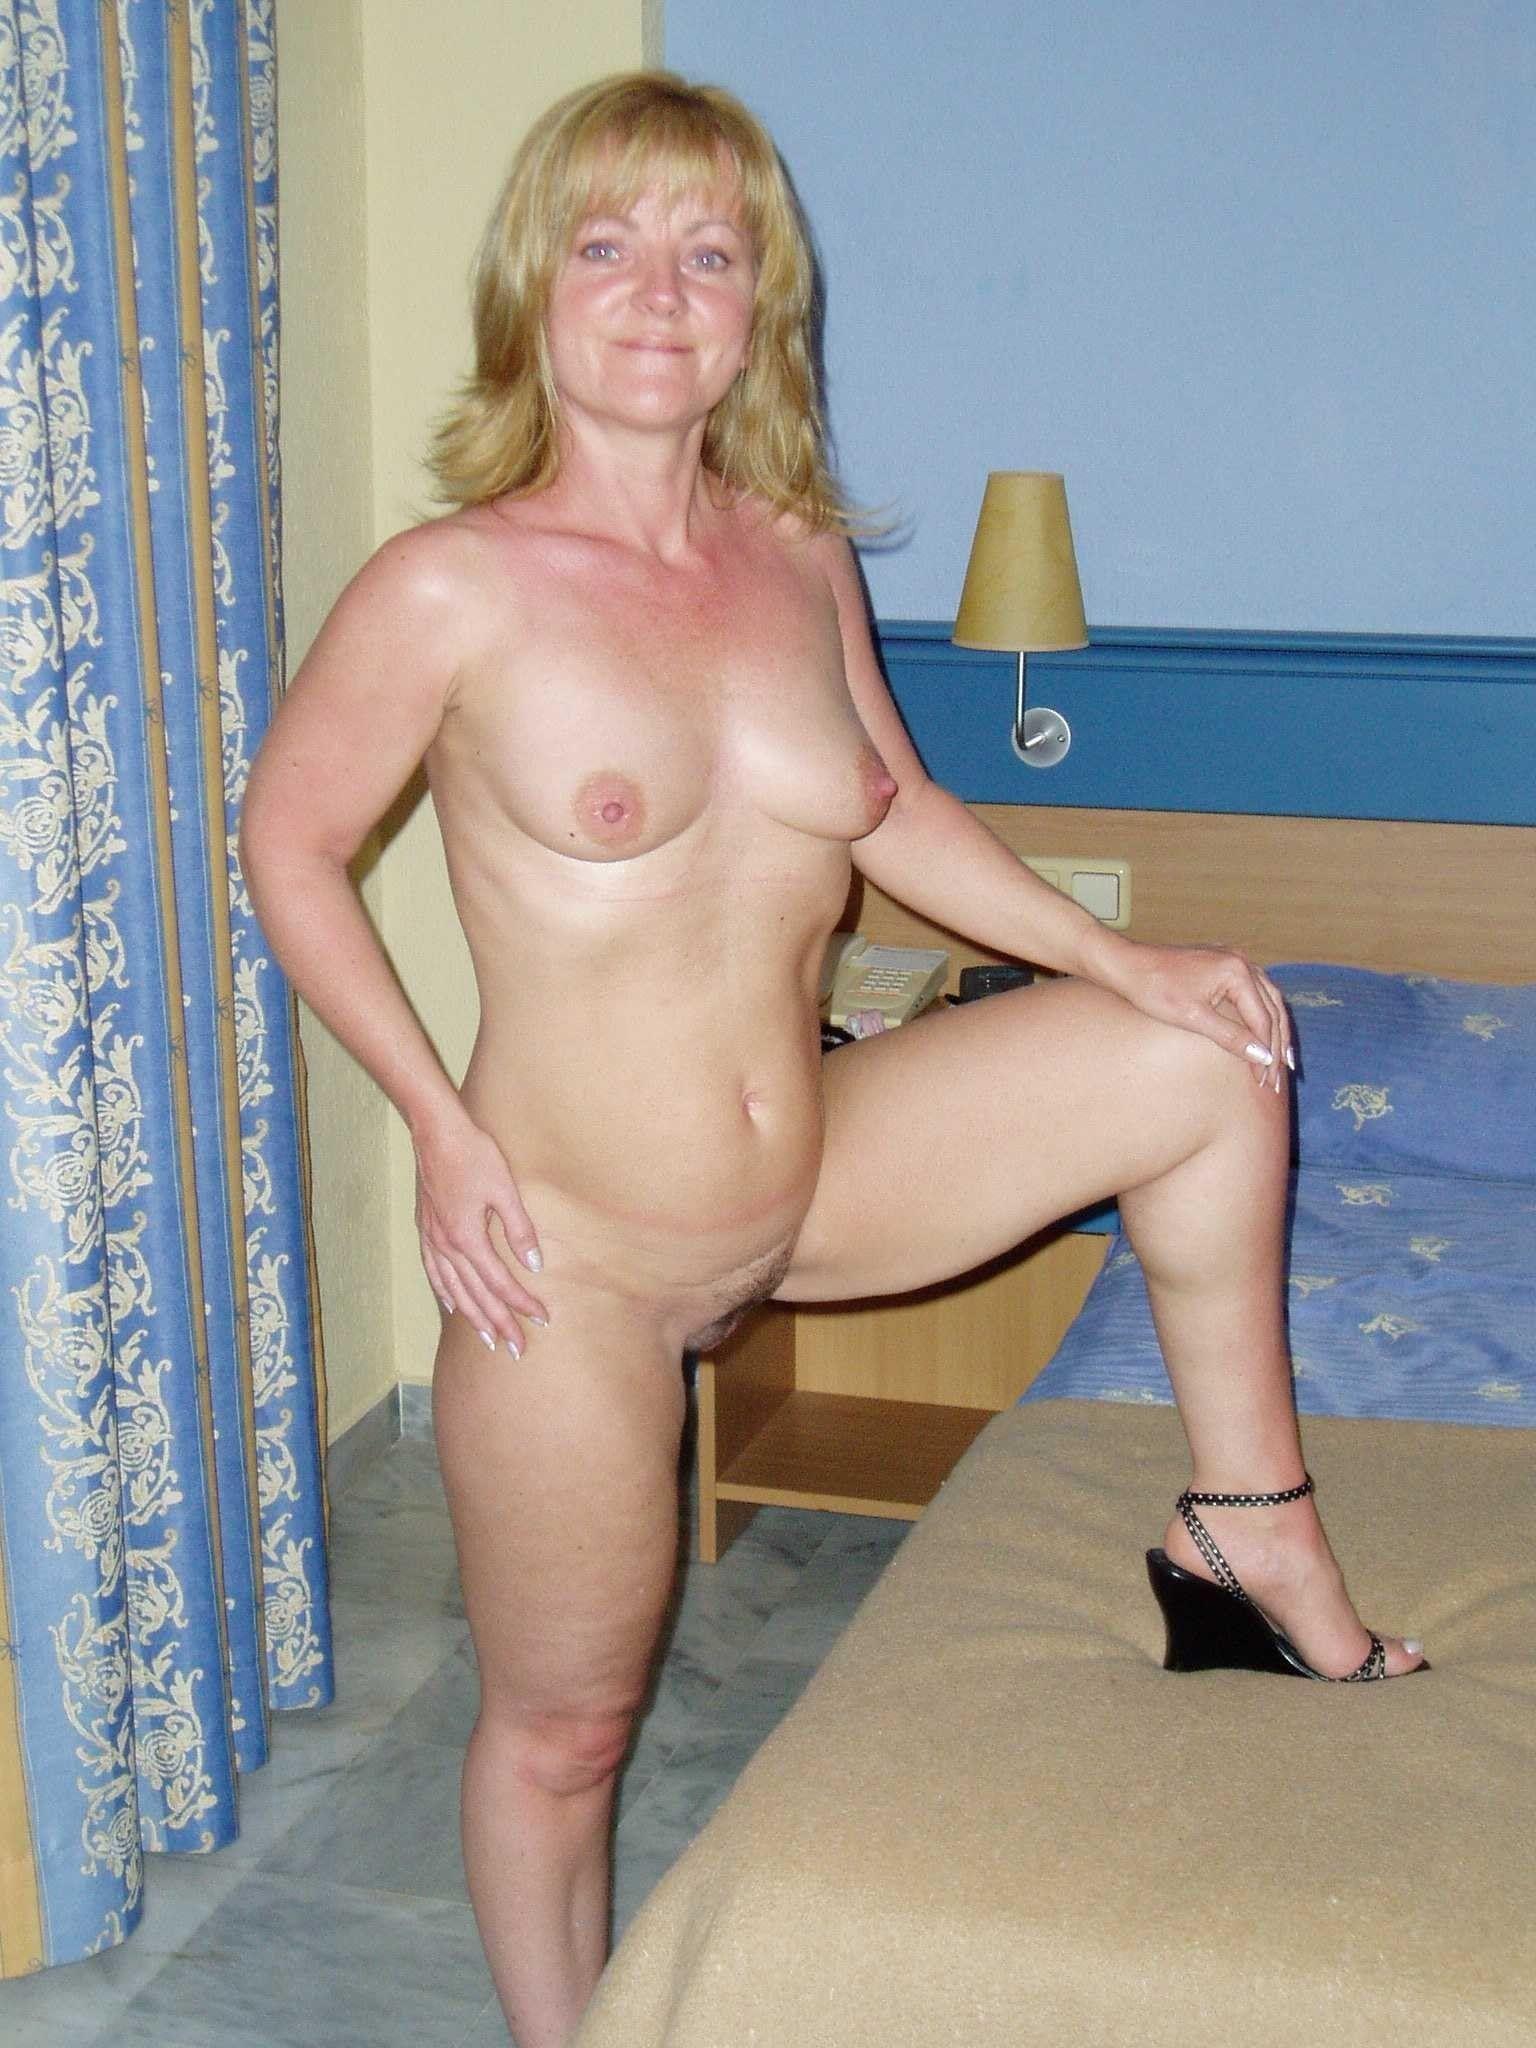 Amateur Porn Housewife porn amateur housewife. quality porn free image.